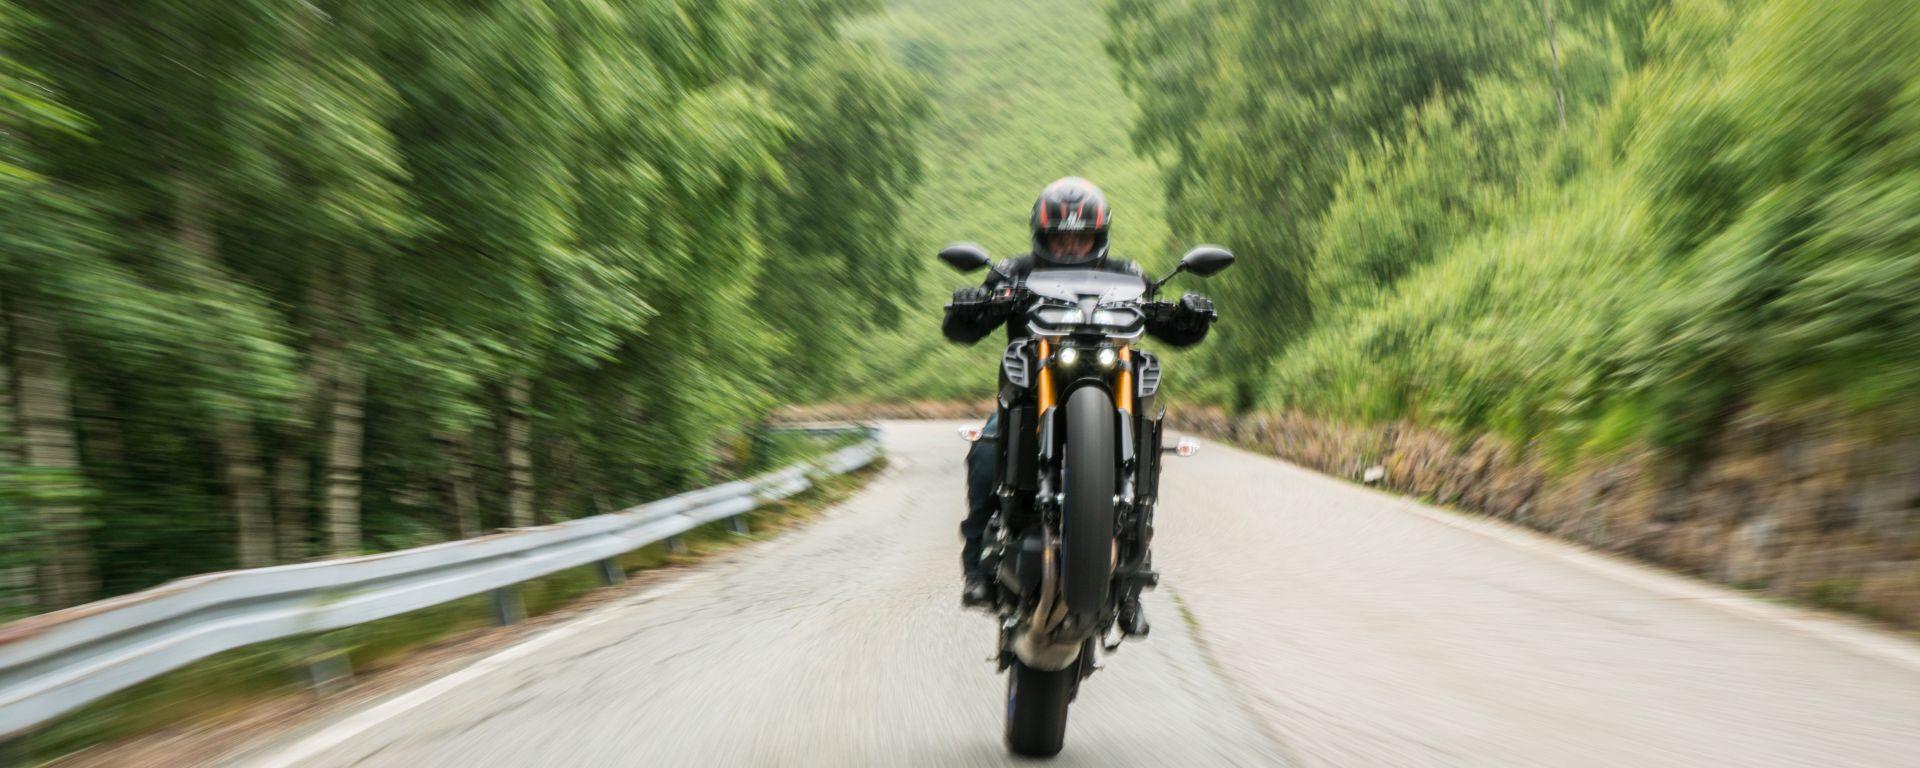 Yamaha: in arrivo una nuova MT-09 con motore Euro 5